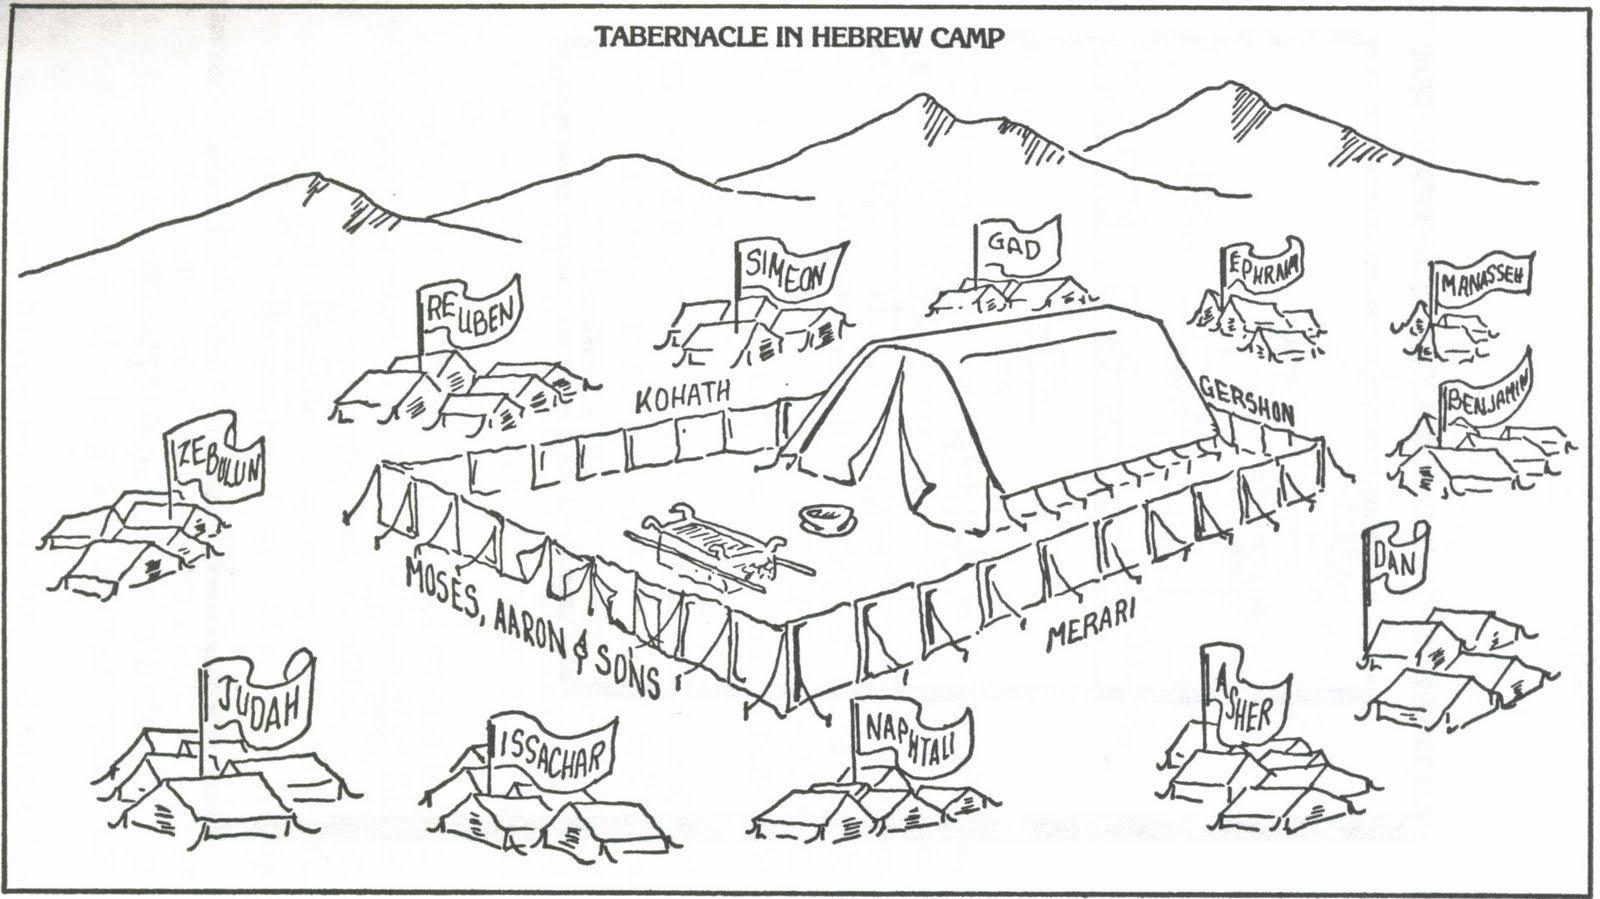 Tabernacle Coloring Page Free   Wonder Kids - Week 5: Ten - Free Printable Pictures Of The Tabernacle